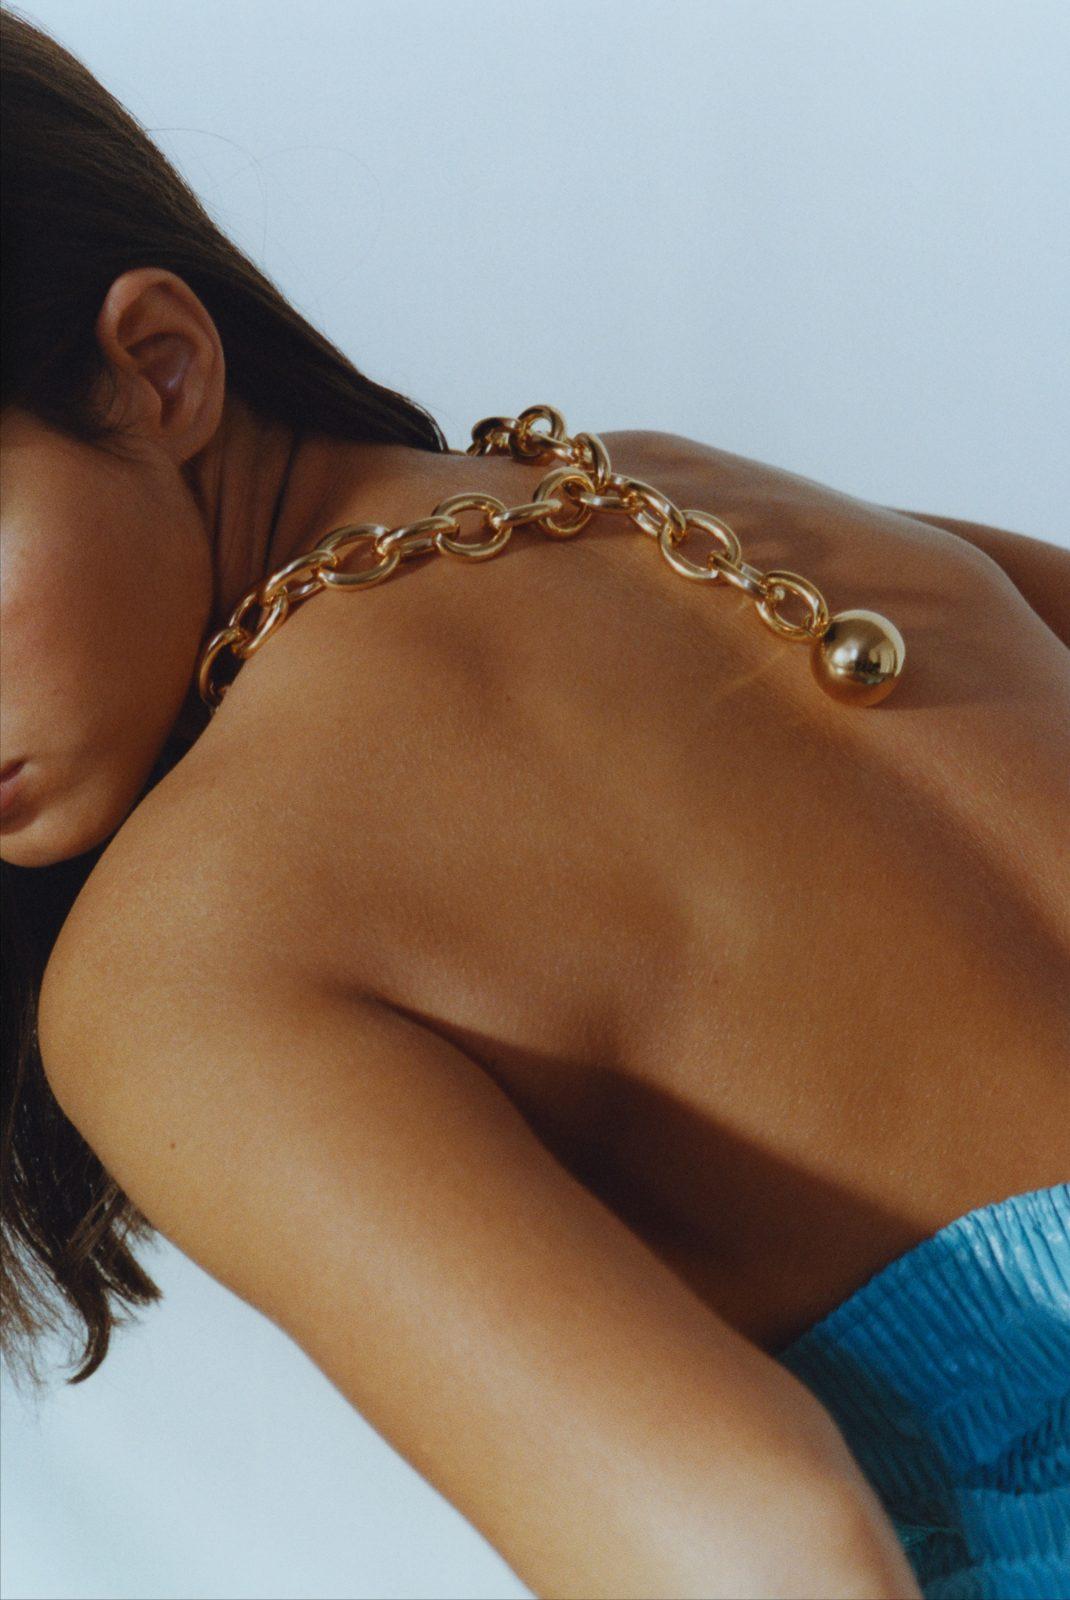 Bottega Veneta Spring 2020 Jewelry Project Photos